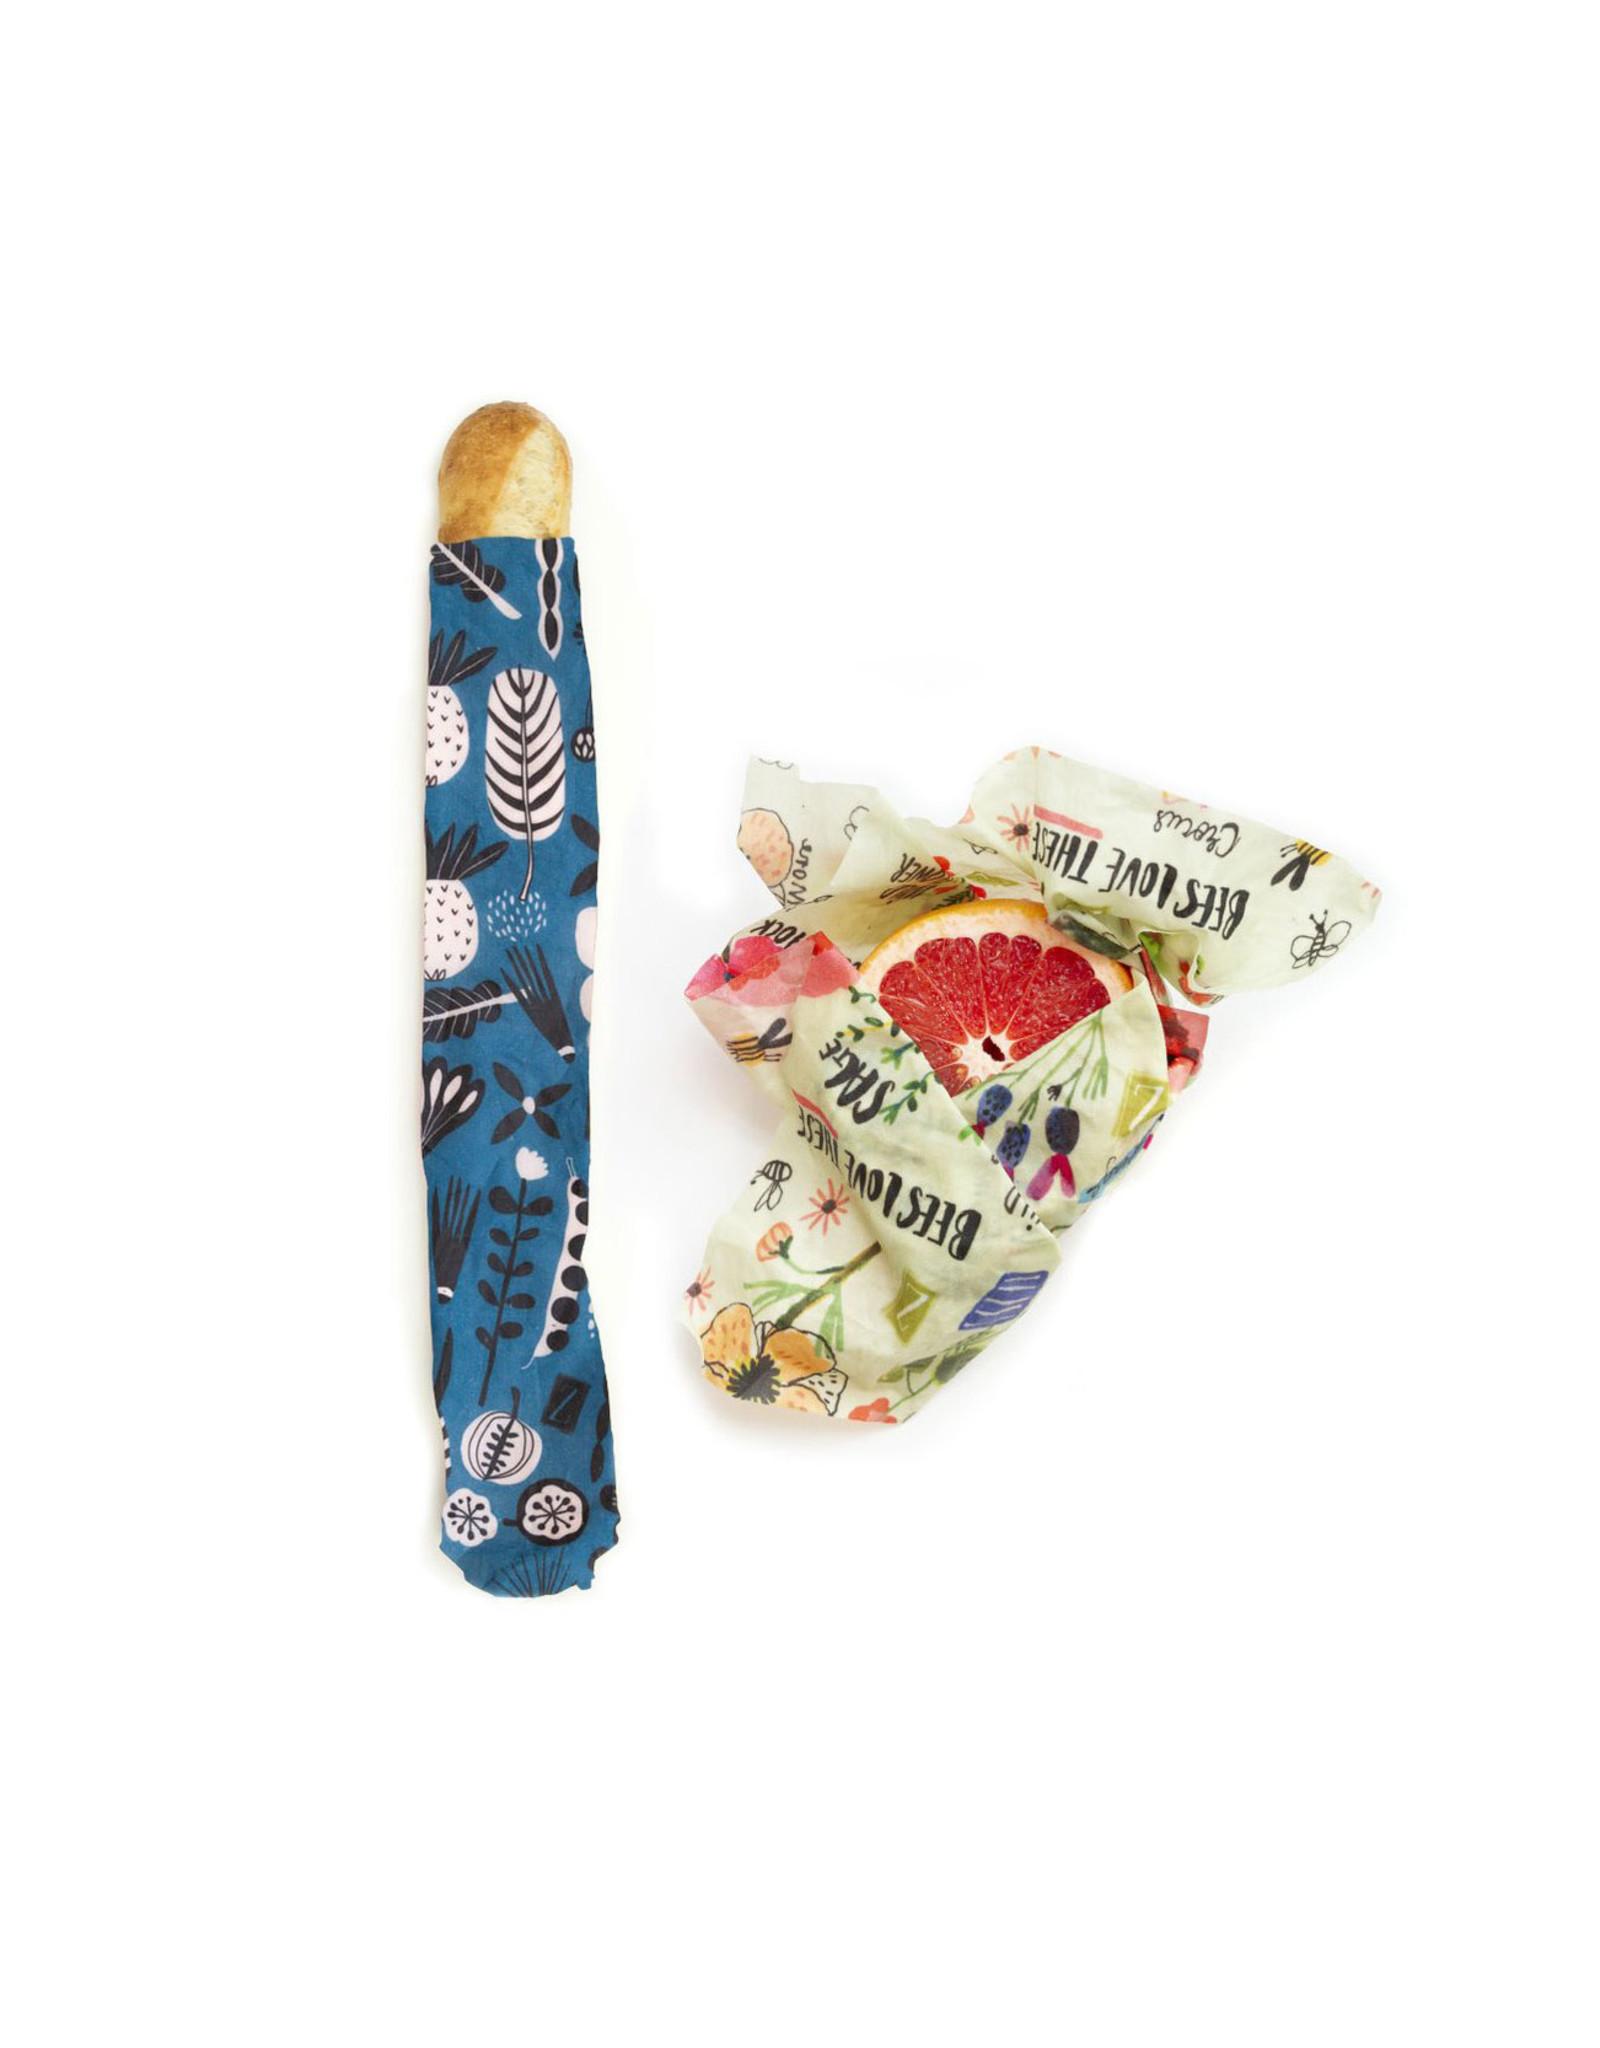 Z Wraps 2pk Z Wraps M/XL - Bees & Petals